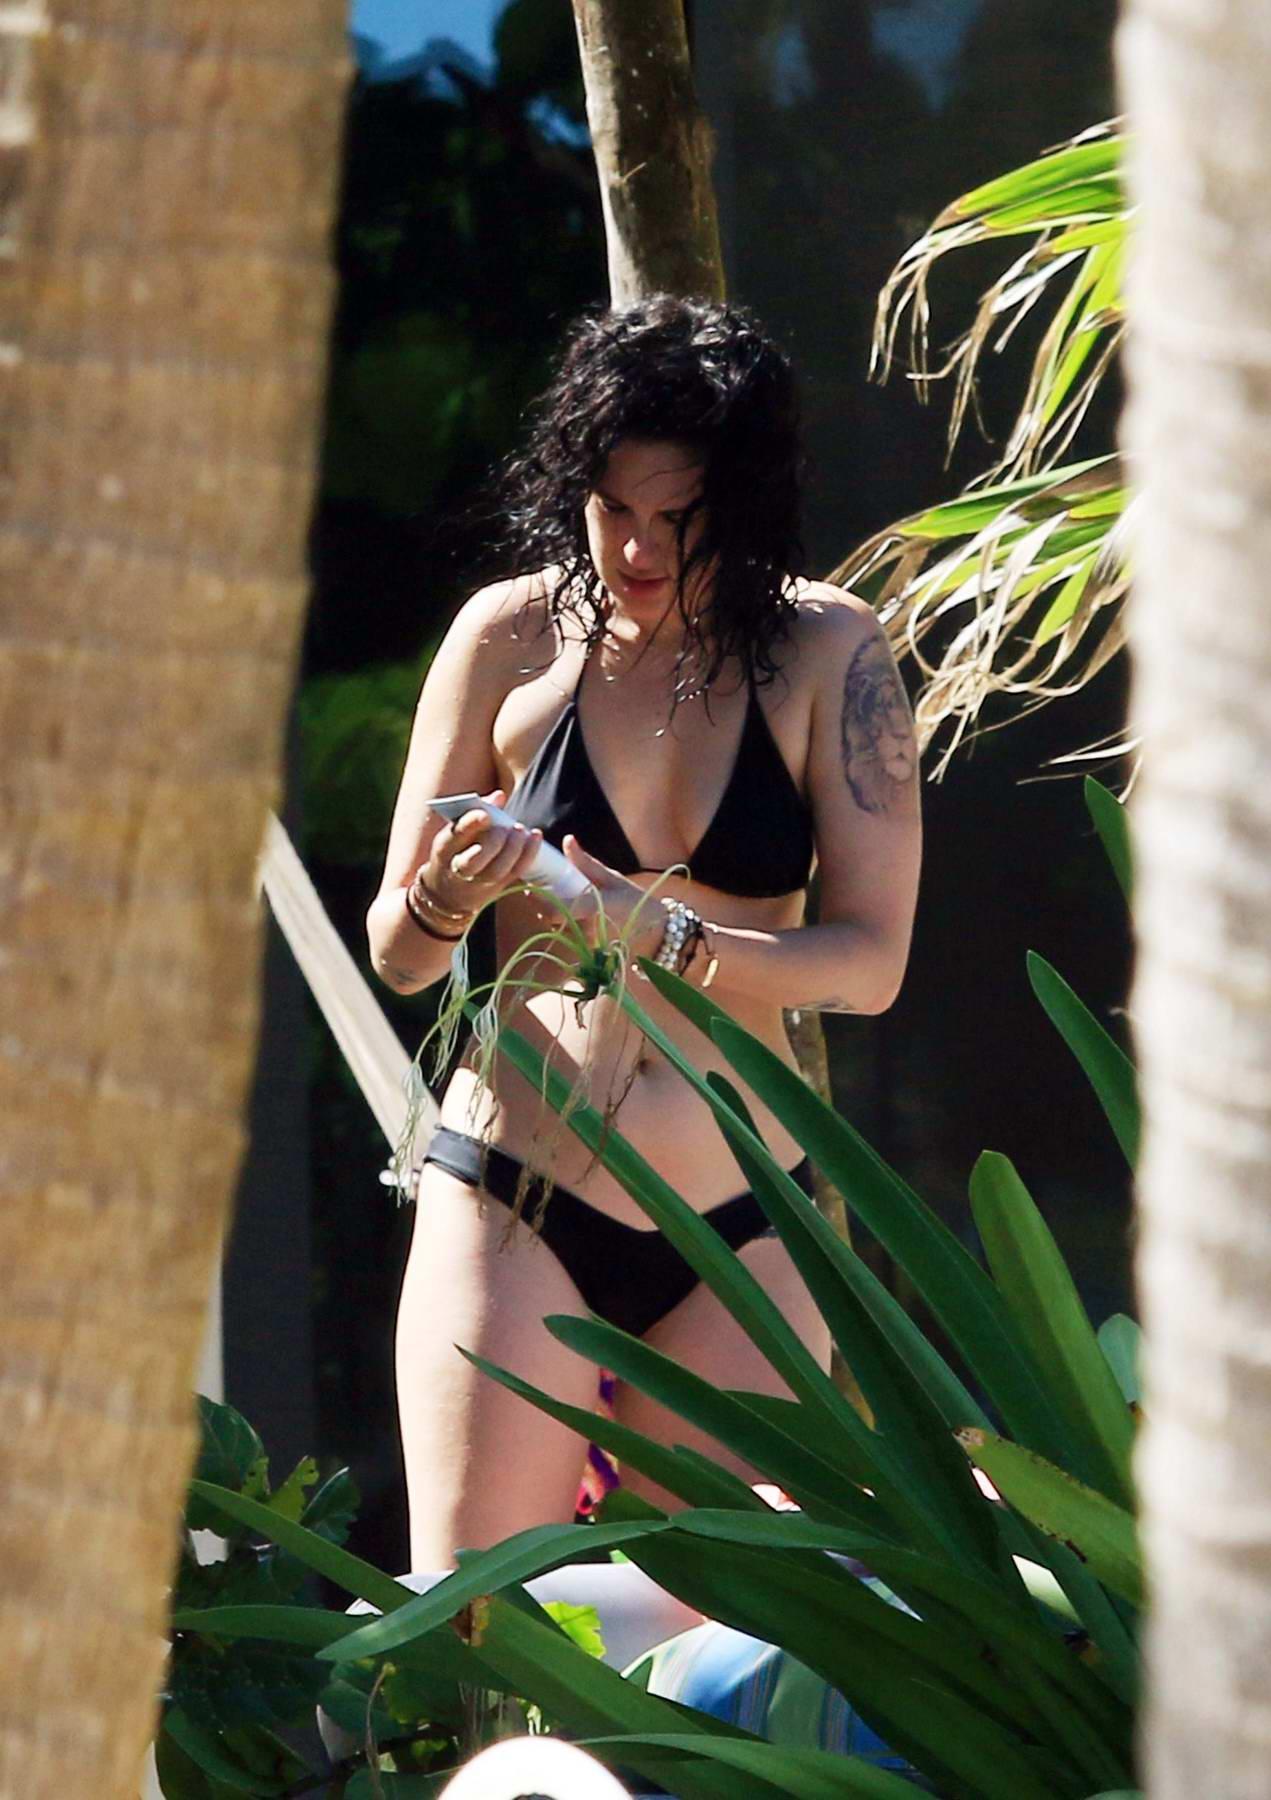 Rumer Willis in a black bikini relaxing on the beach in Tulum, Quintana Roo, Mexico